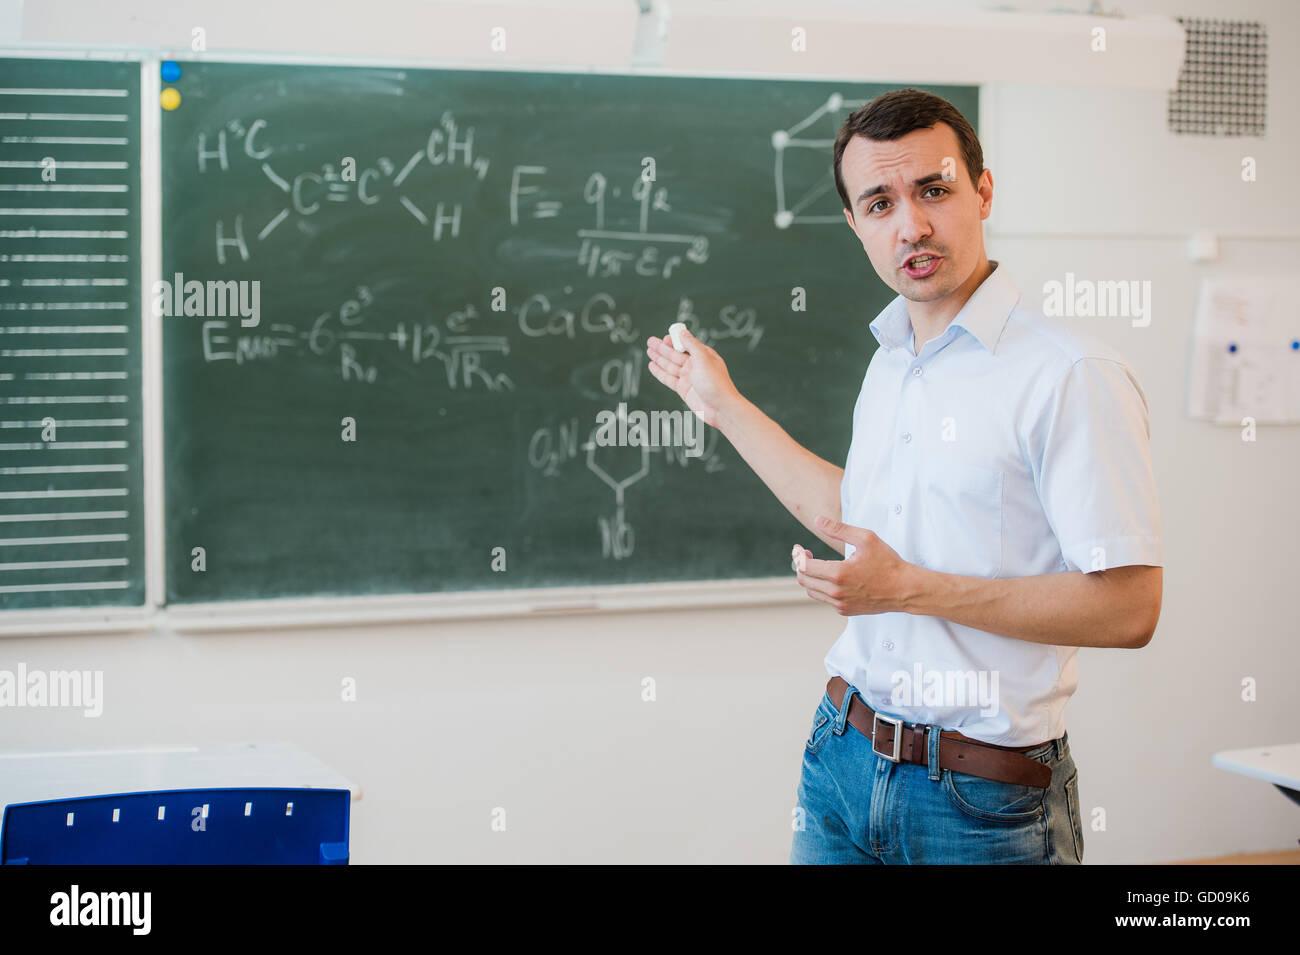 Young teacher near chalkboard in school classroom talking to class - Stock Image